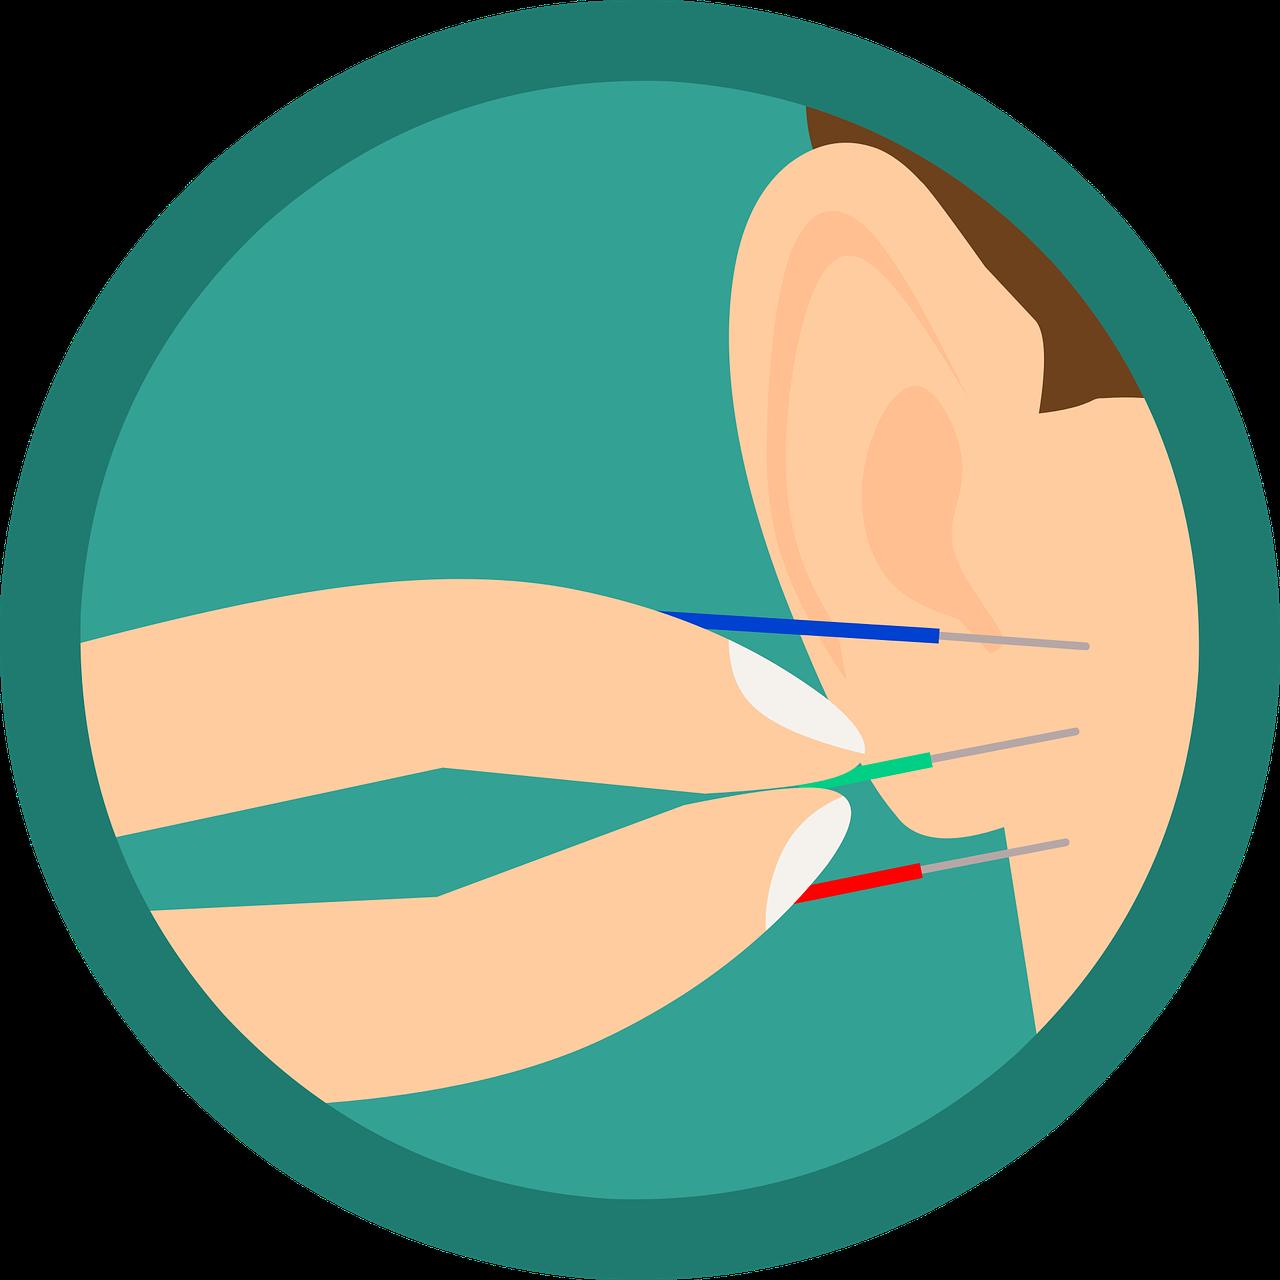 Fysiotherapie Manuele Therapie De Graaf fysio kosten